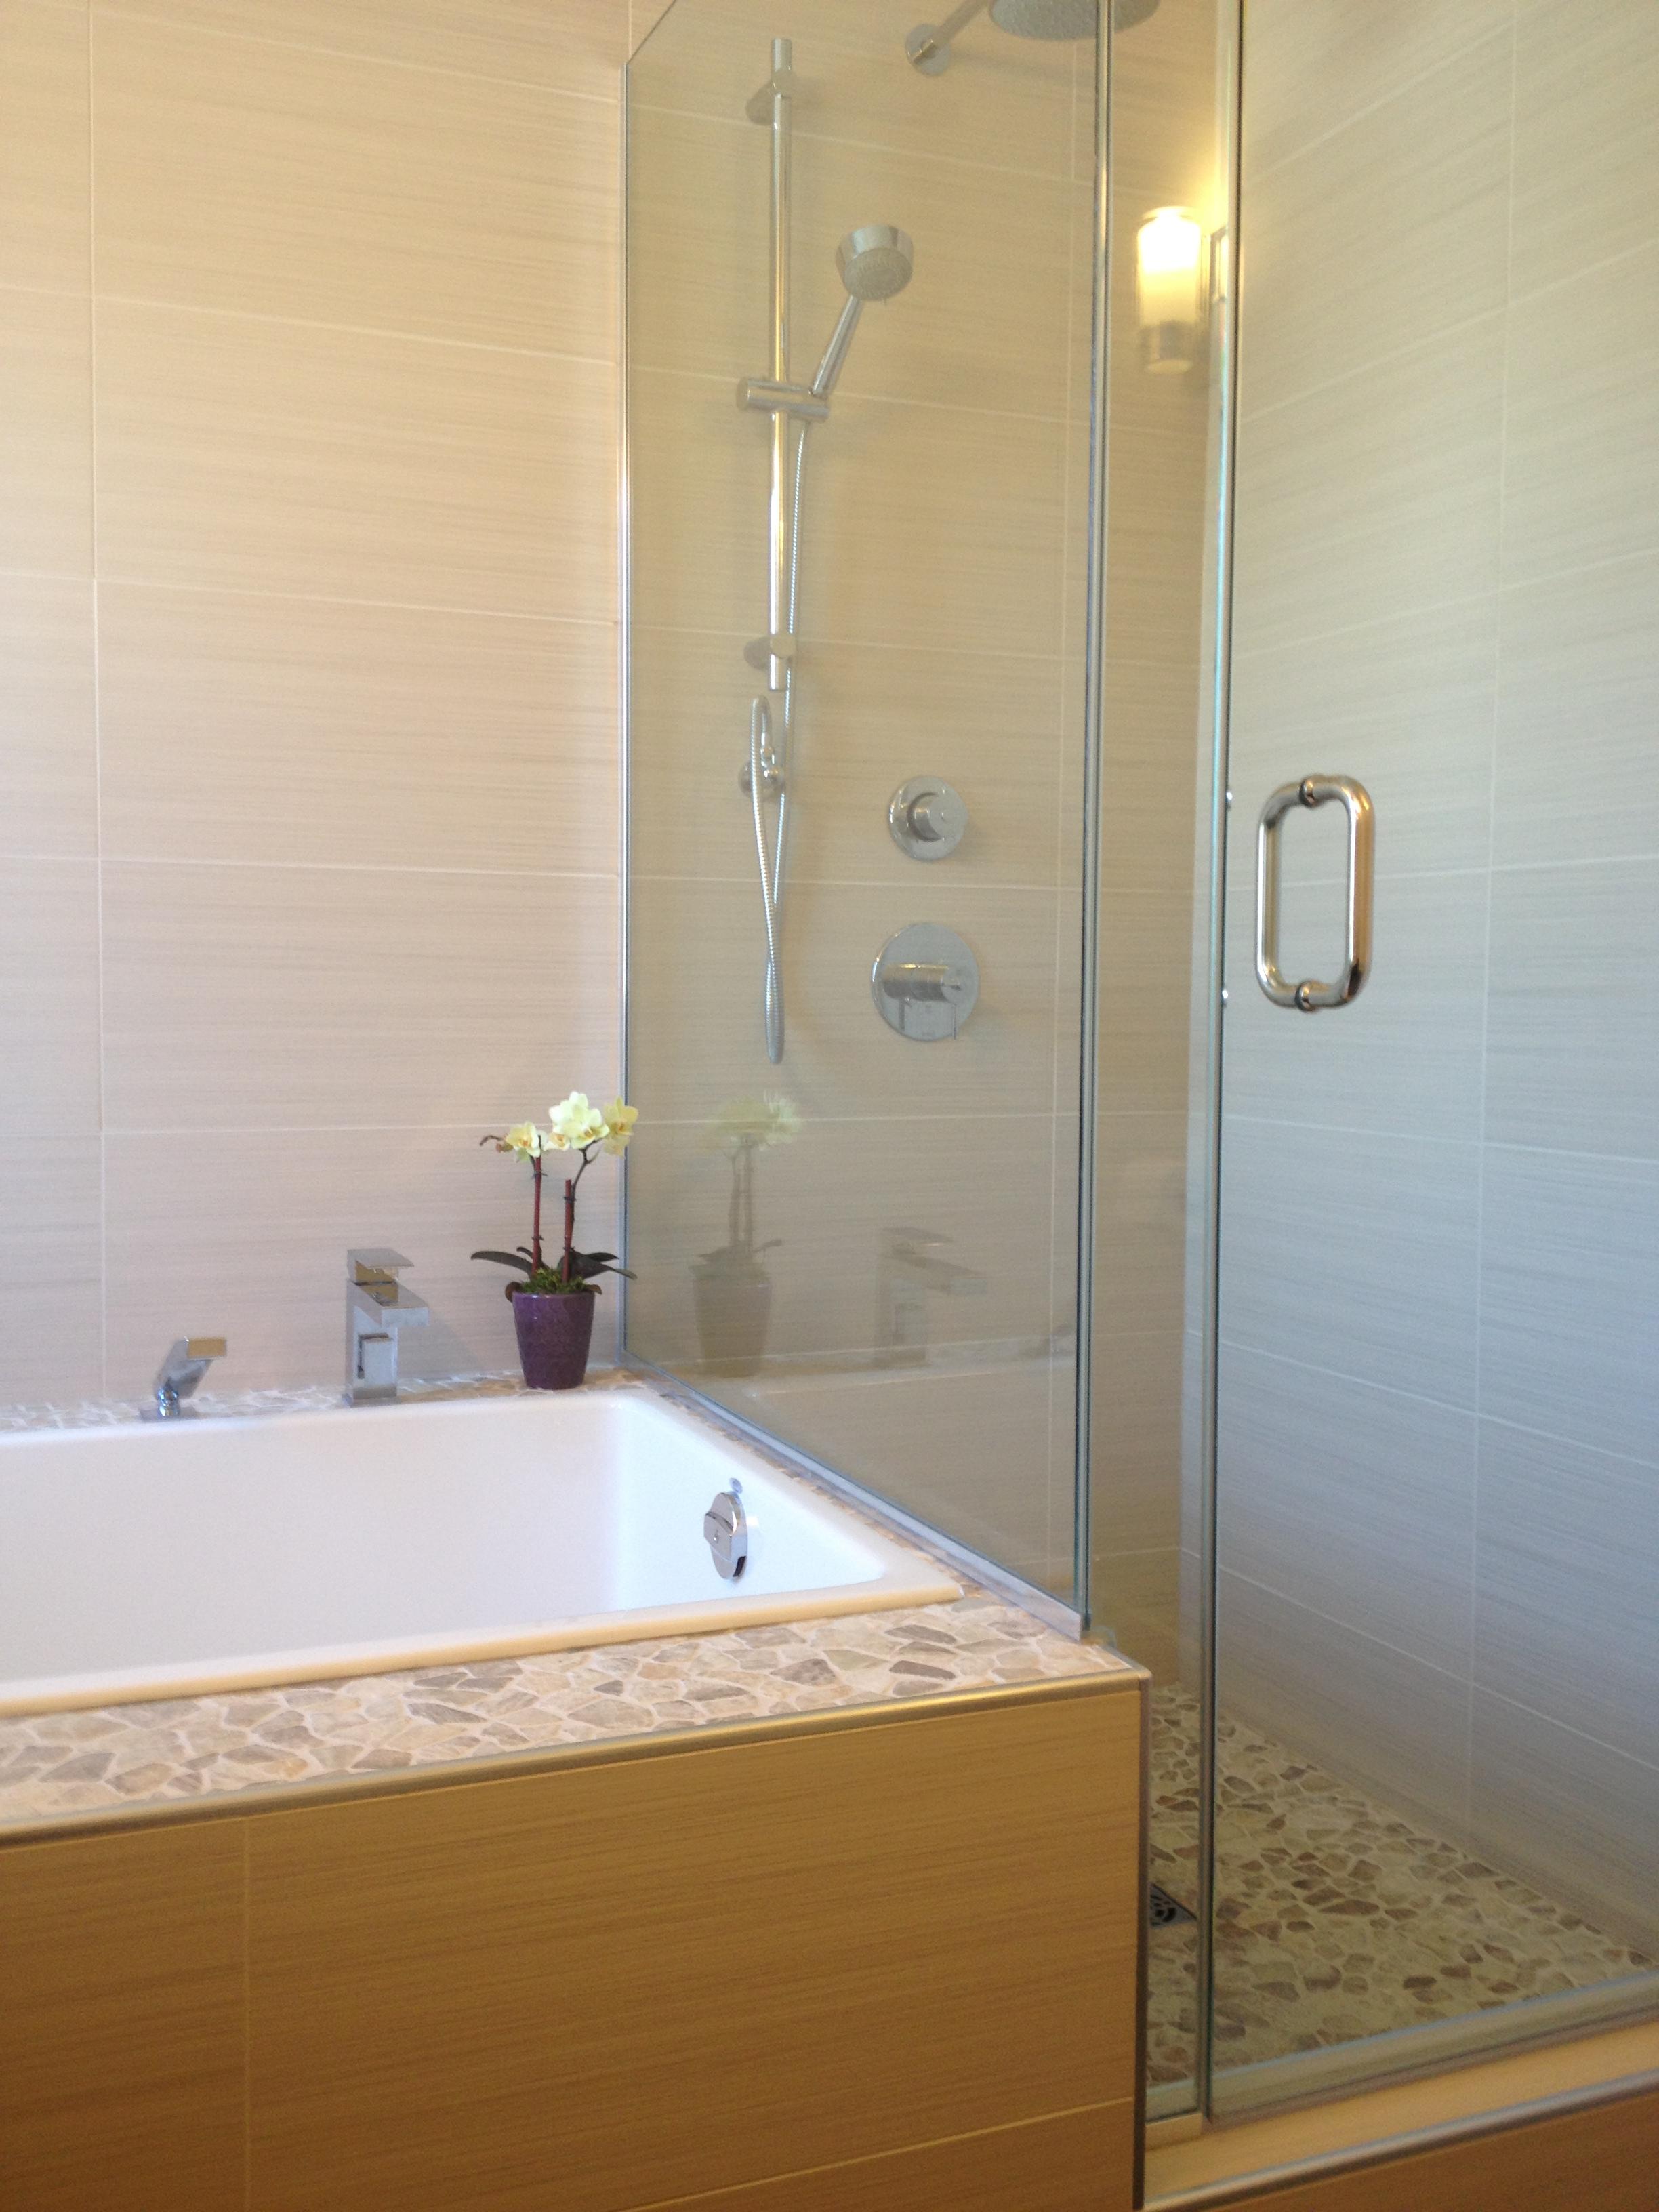 Bonnie Doon Bathroom Renovation